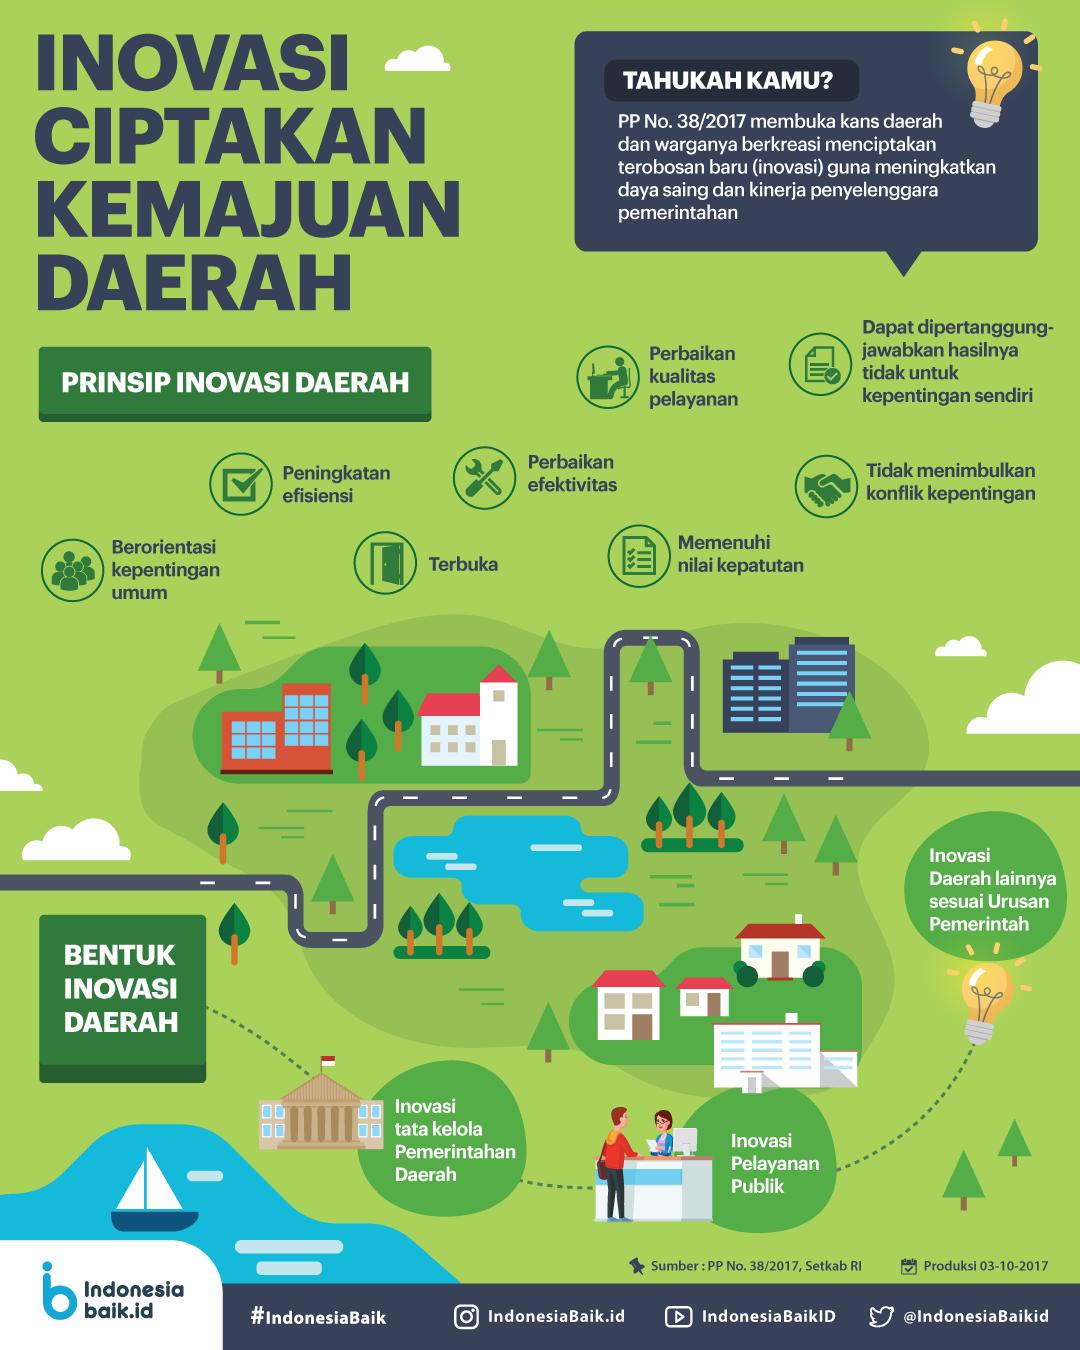 Inovasi Ciptakan Kemajuan Daerah